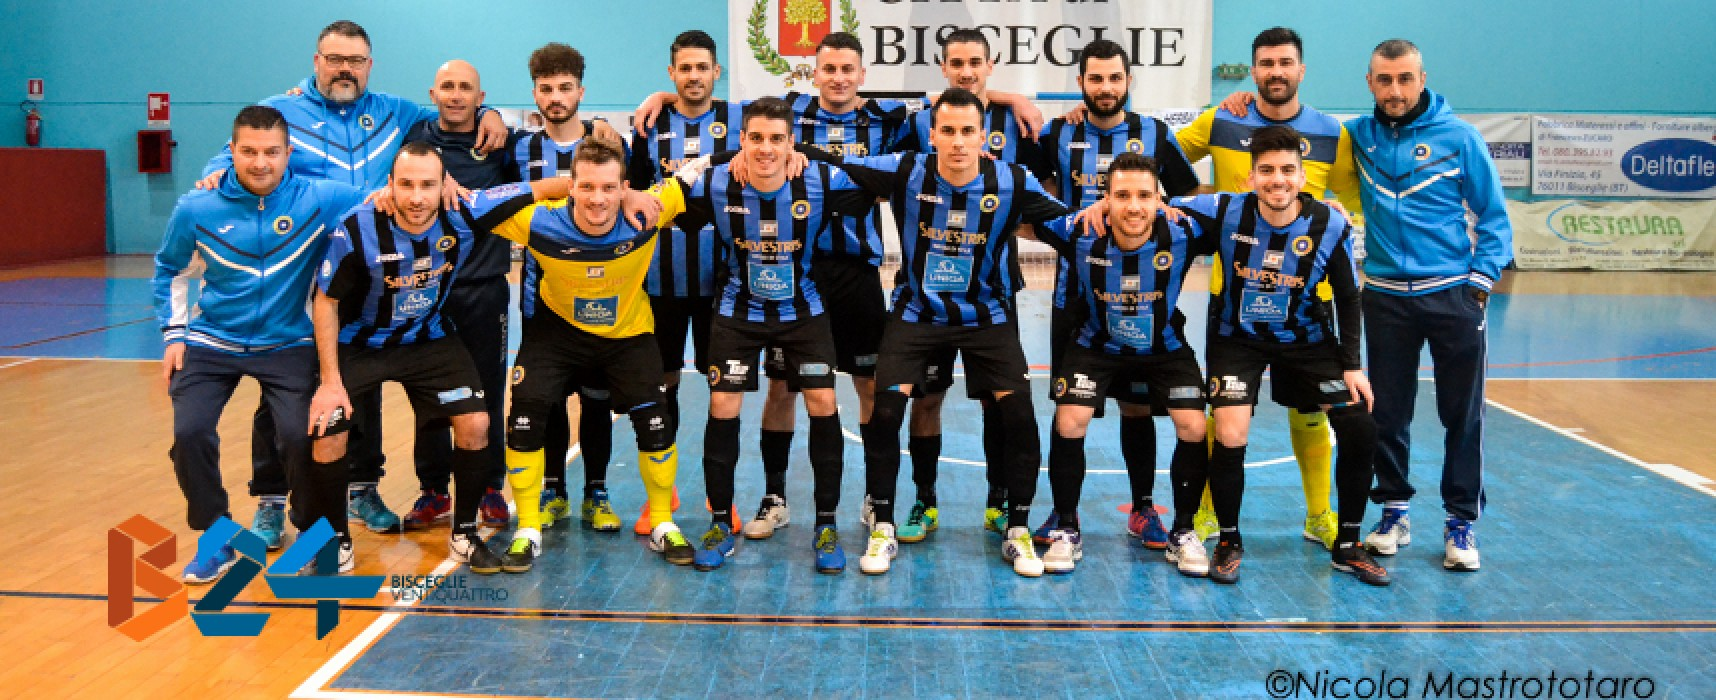 Diretta Live: Futsal Cisternino-Futsal Bisceglie 4-4 FINALE